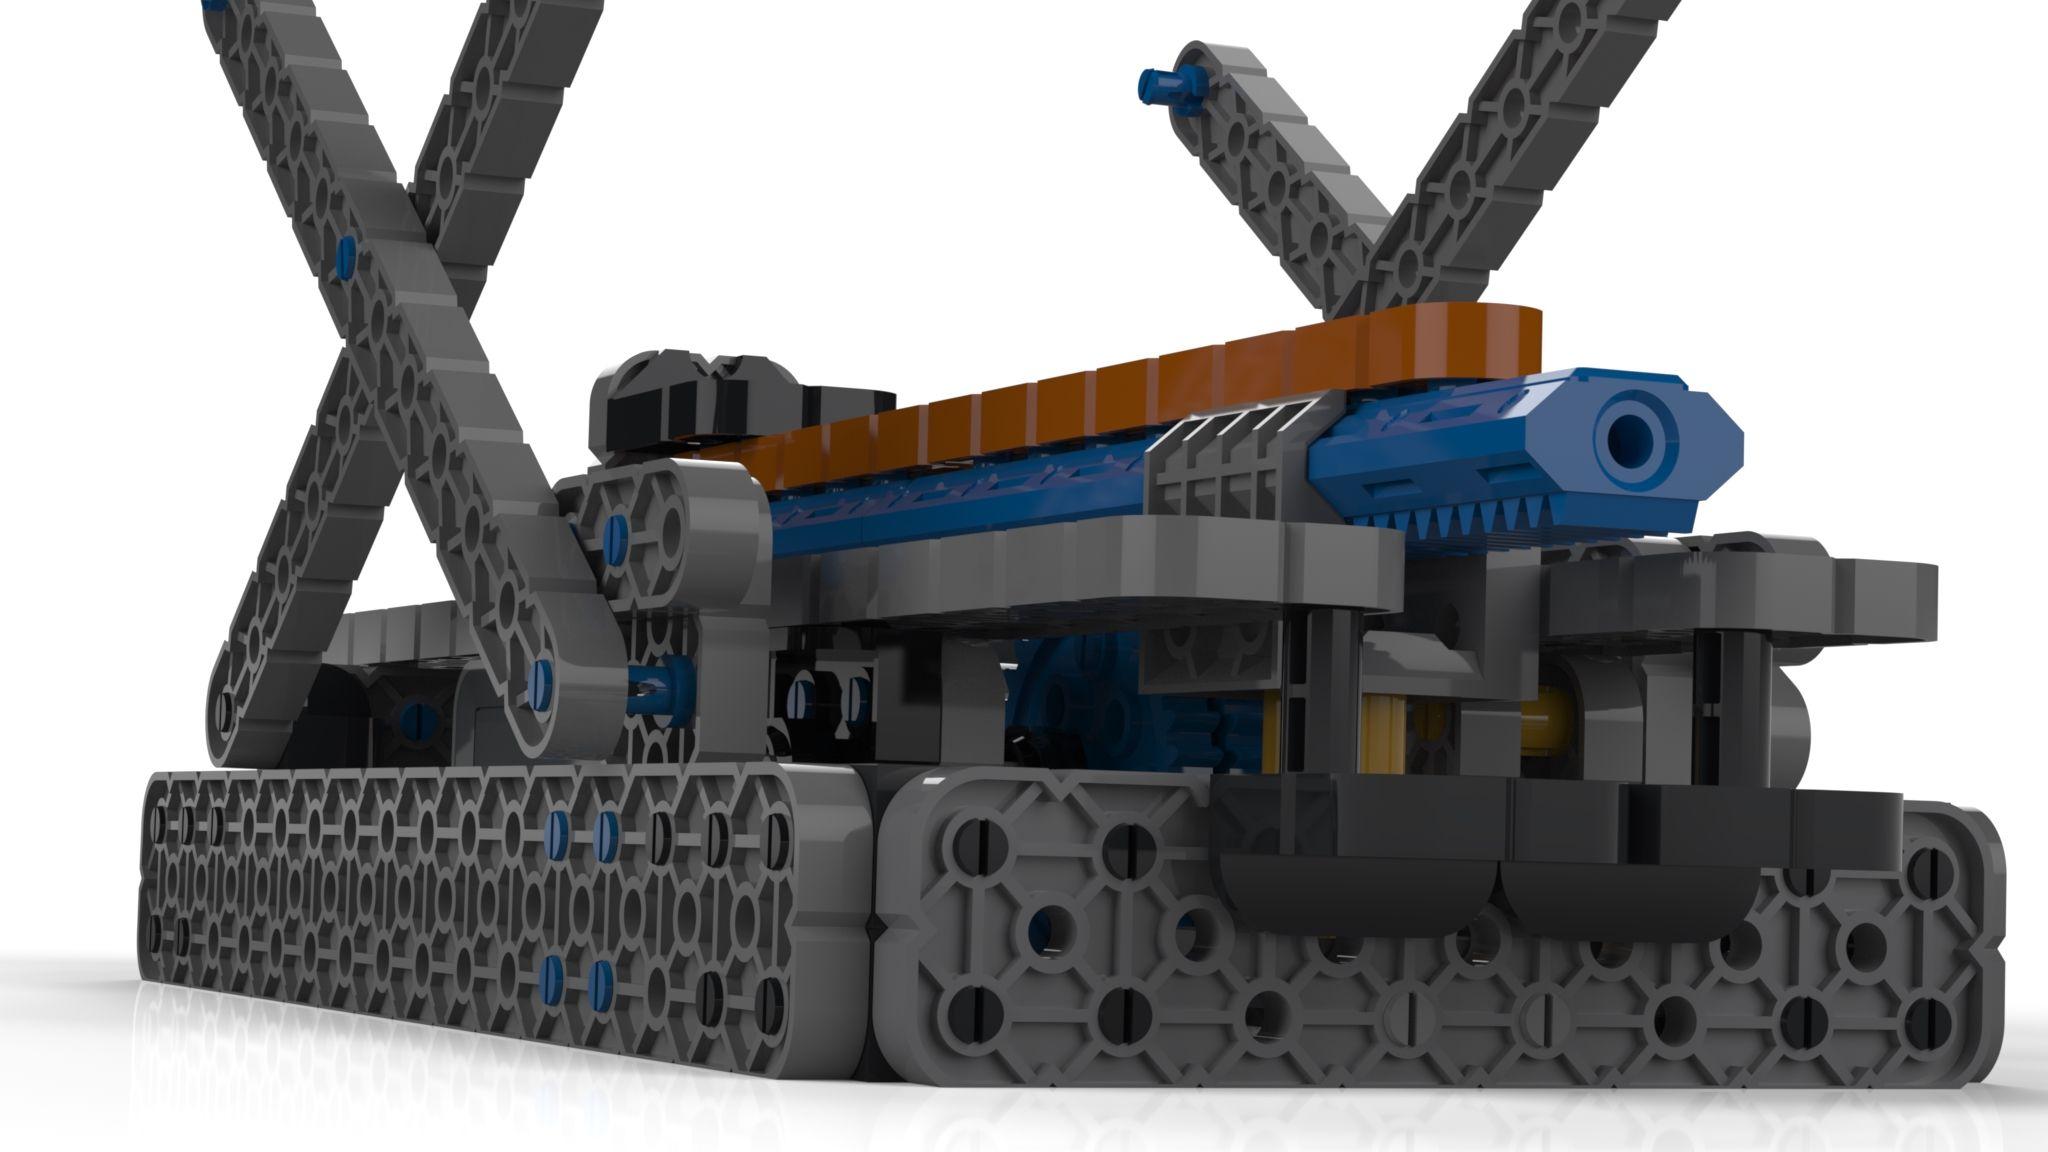 Design-vexiq-elevation---fabrica-de-nerdes-lcs-18-3500-3500